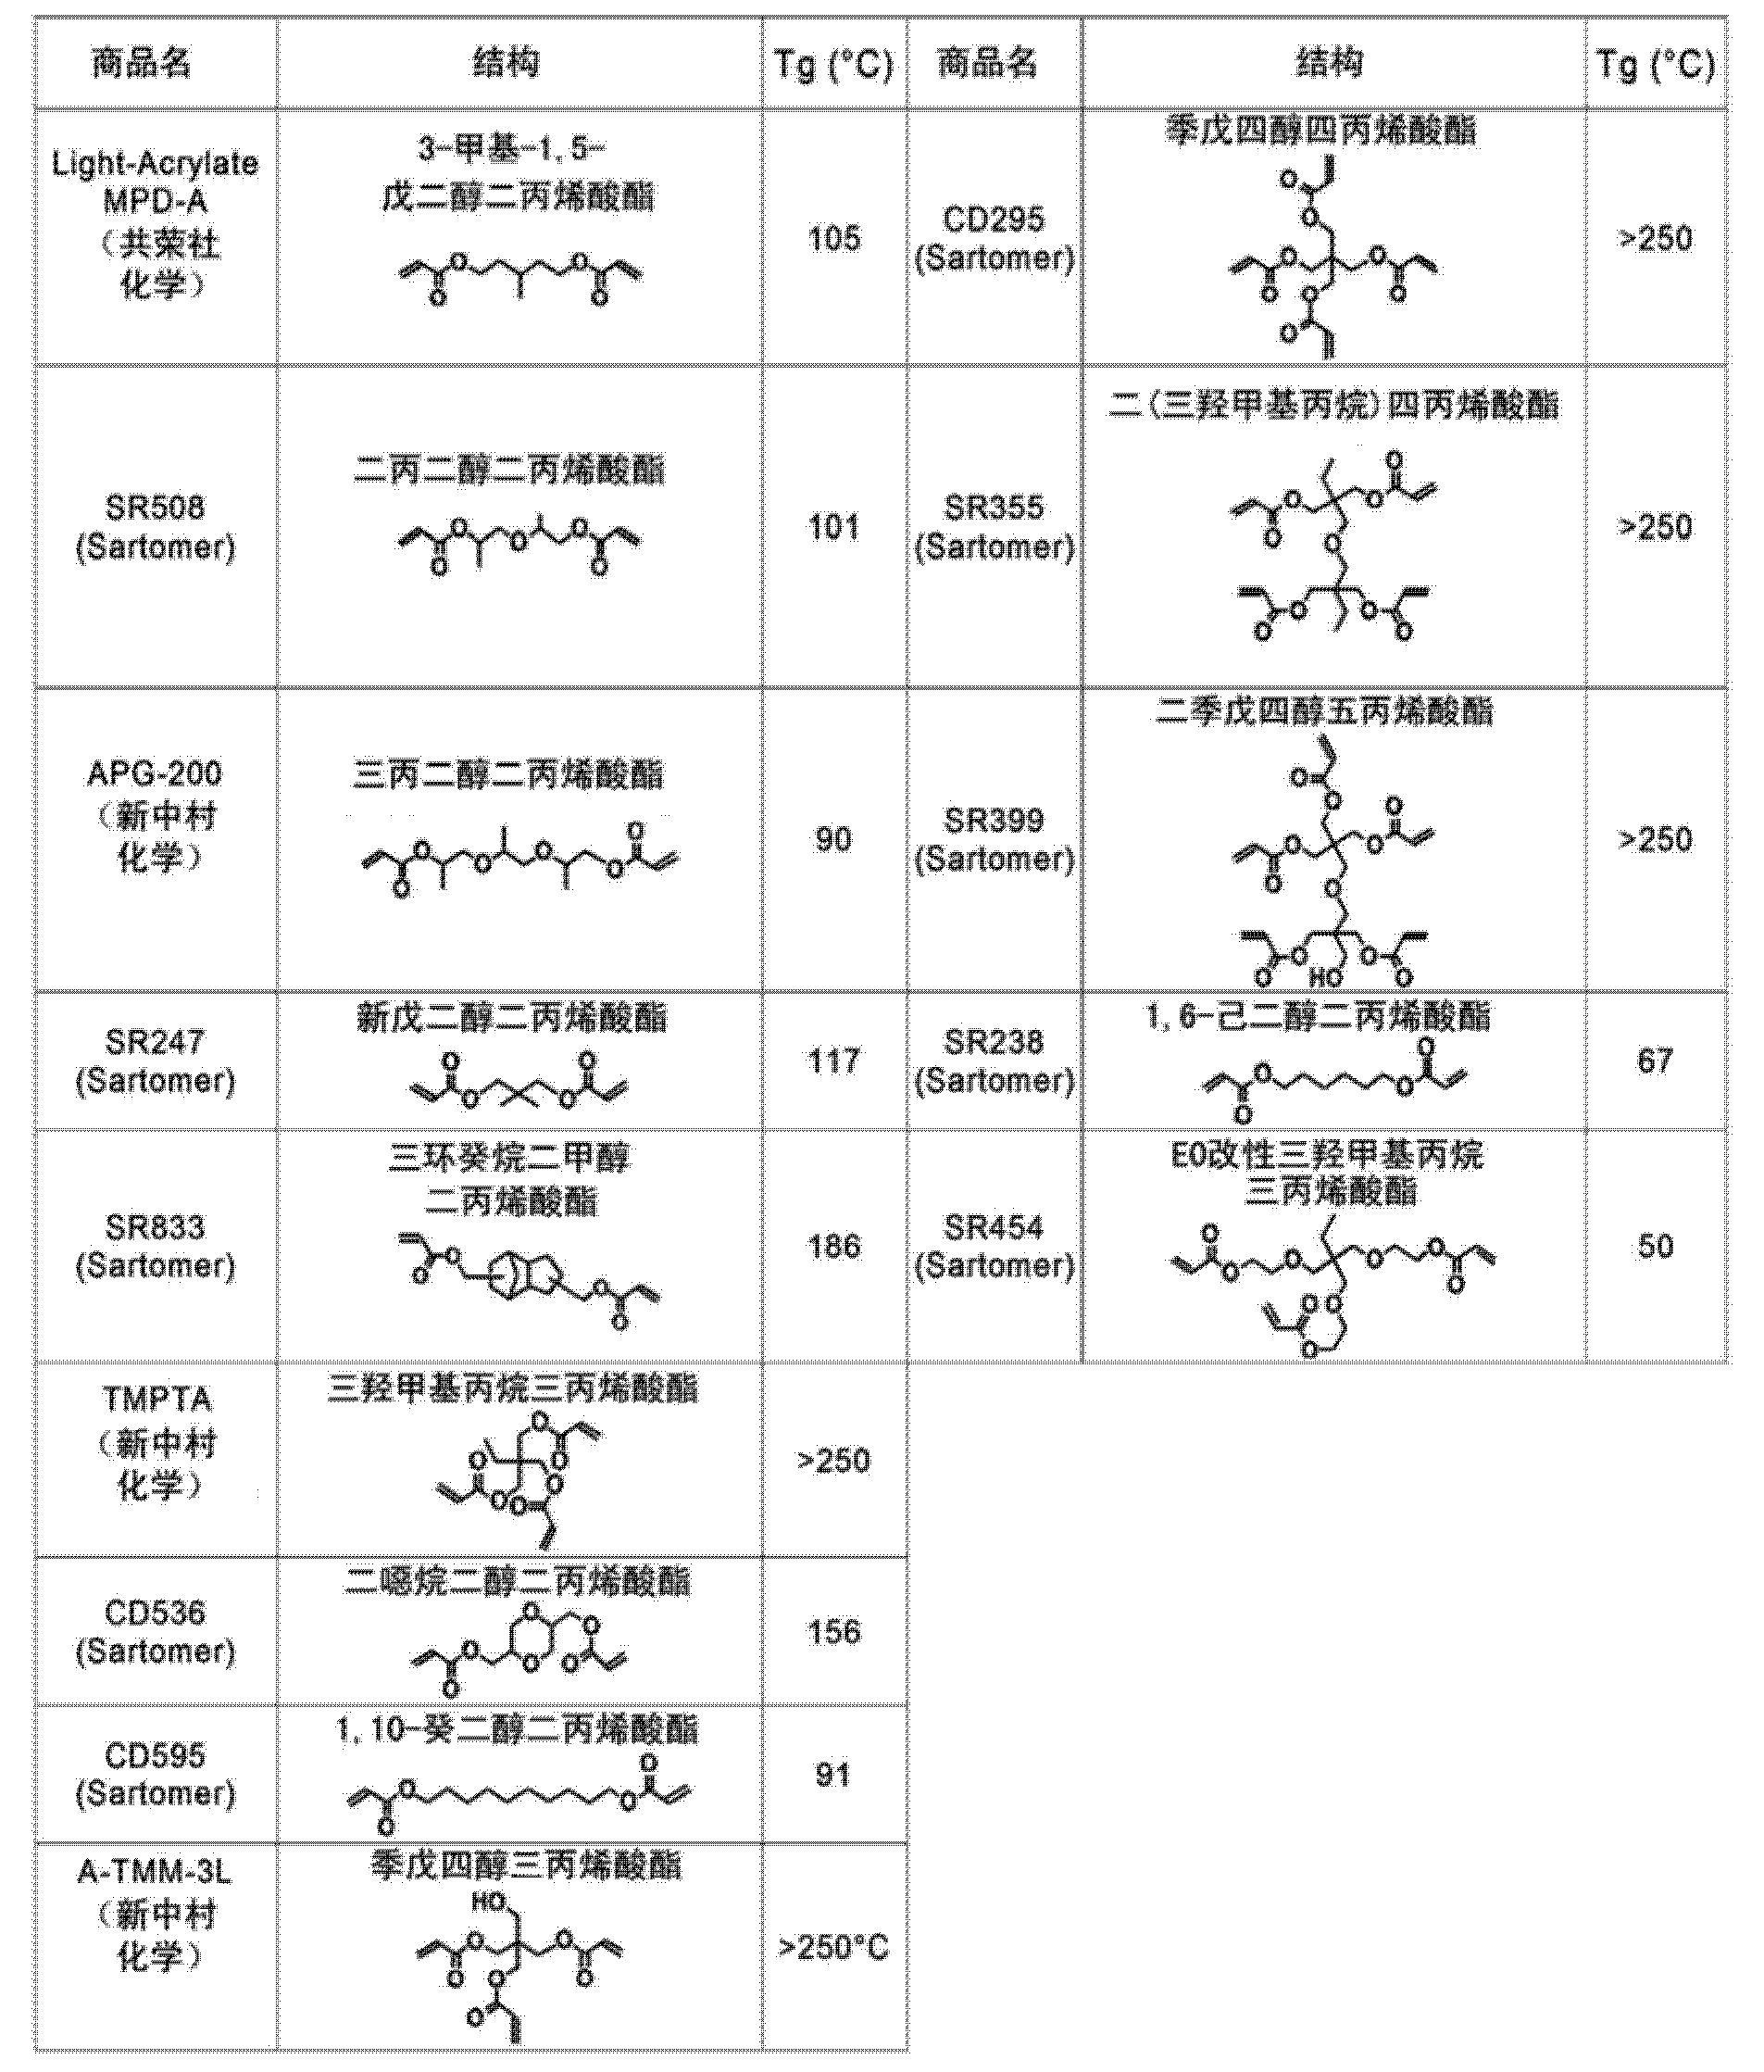 CN104228382A - Image formation method, decorative sheet